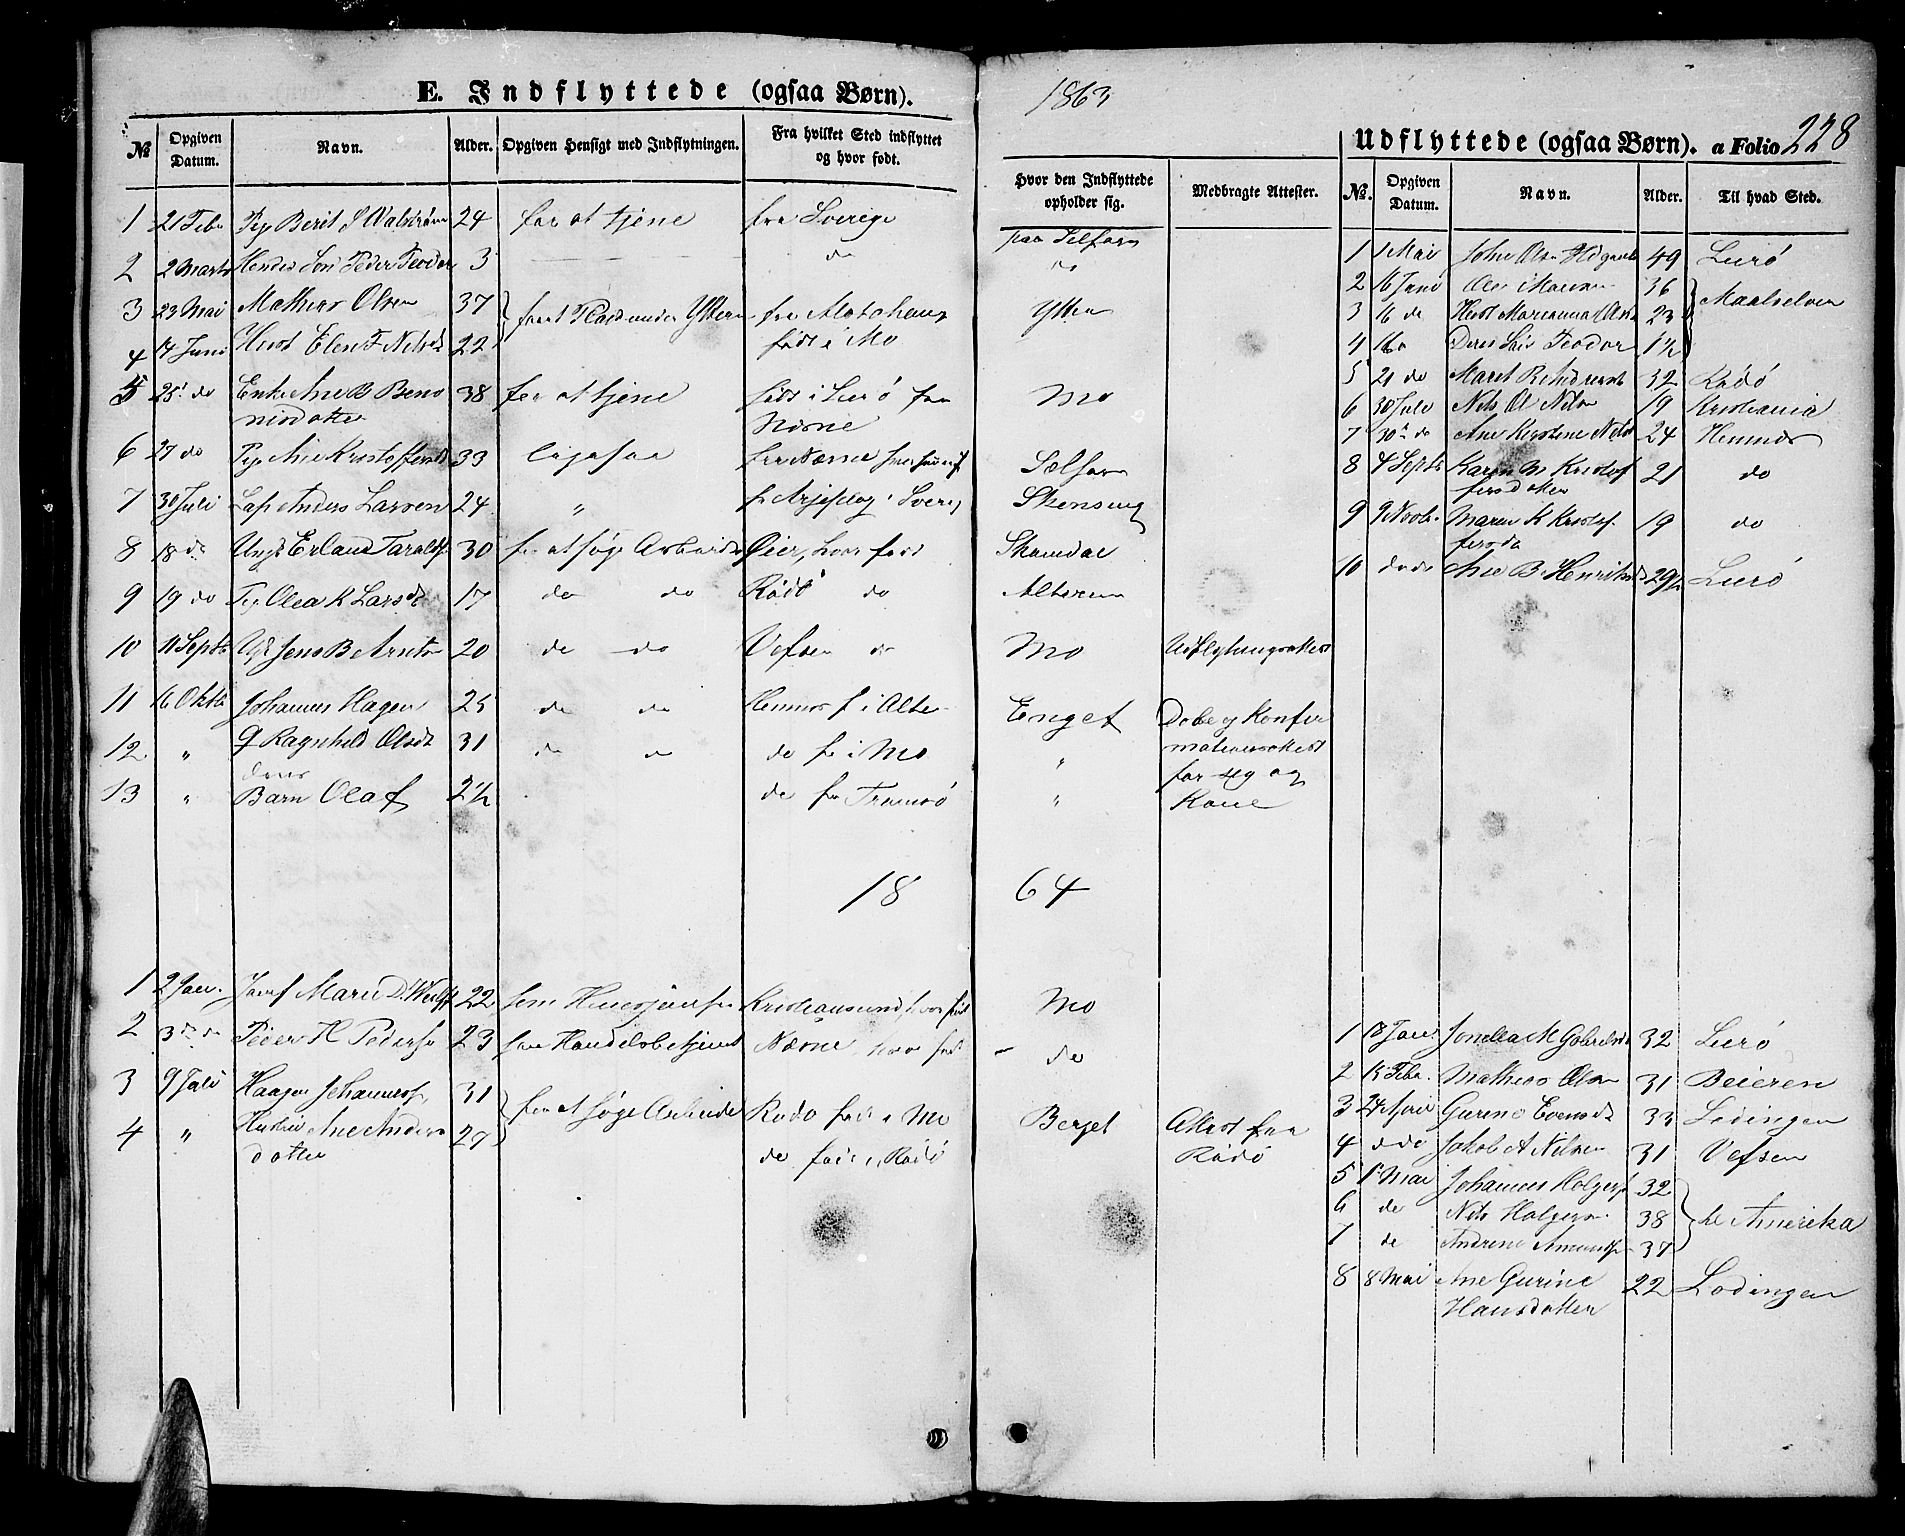 SAT, Ministerialprotokoller, klokkerbøker og fødselsregistre - Nordland, 827/L0414: Klokkerbok nr. 827C03, 1853-1865, s. 228